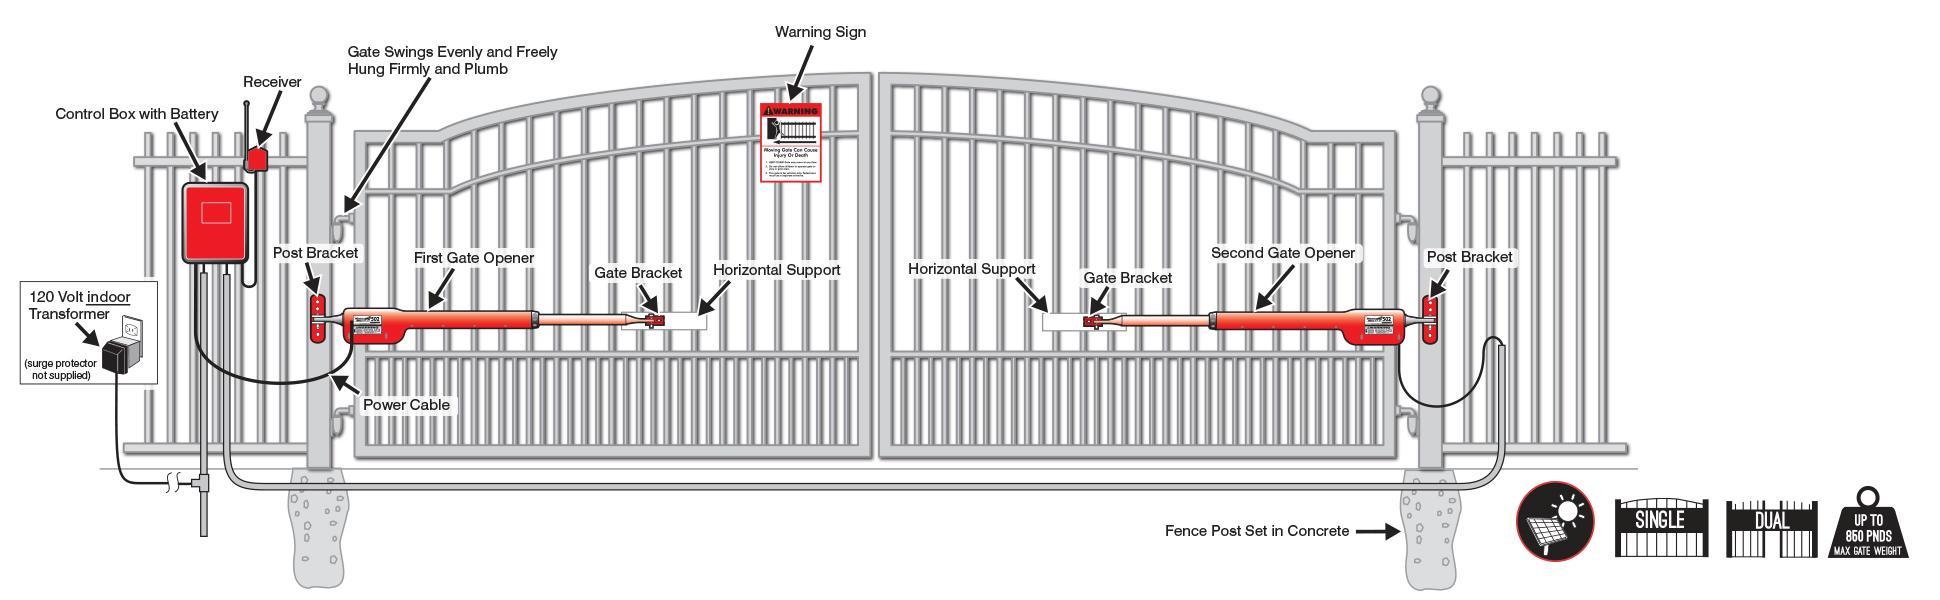 _V326979210_ gate opener best automatic gate opener swing auto gate